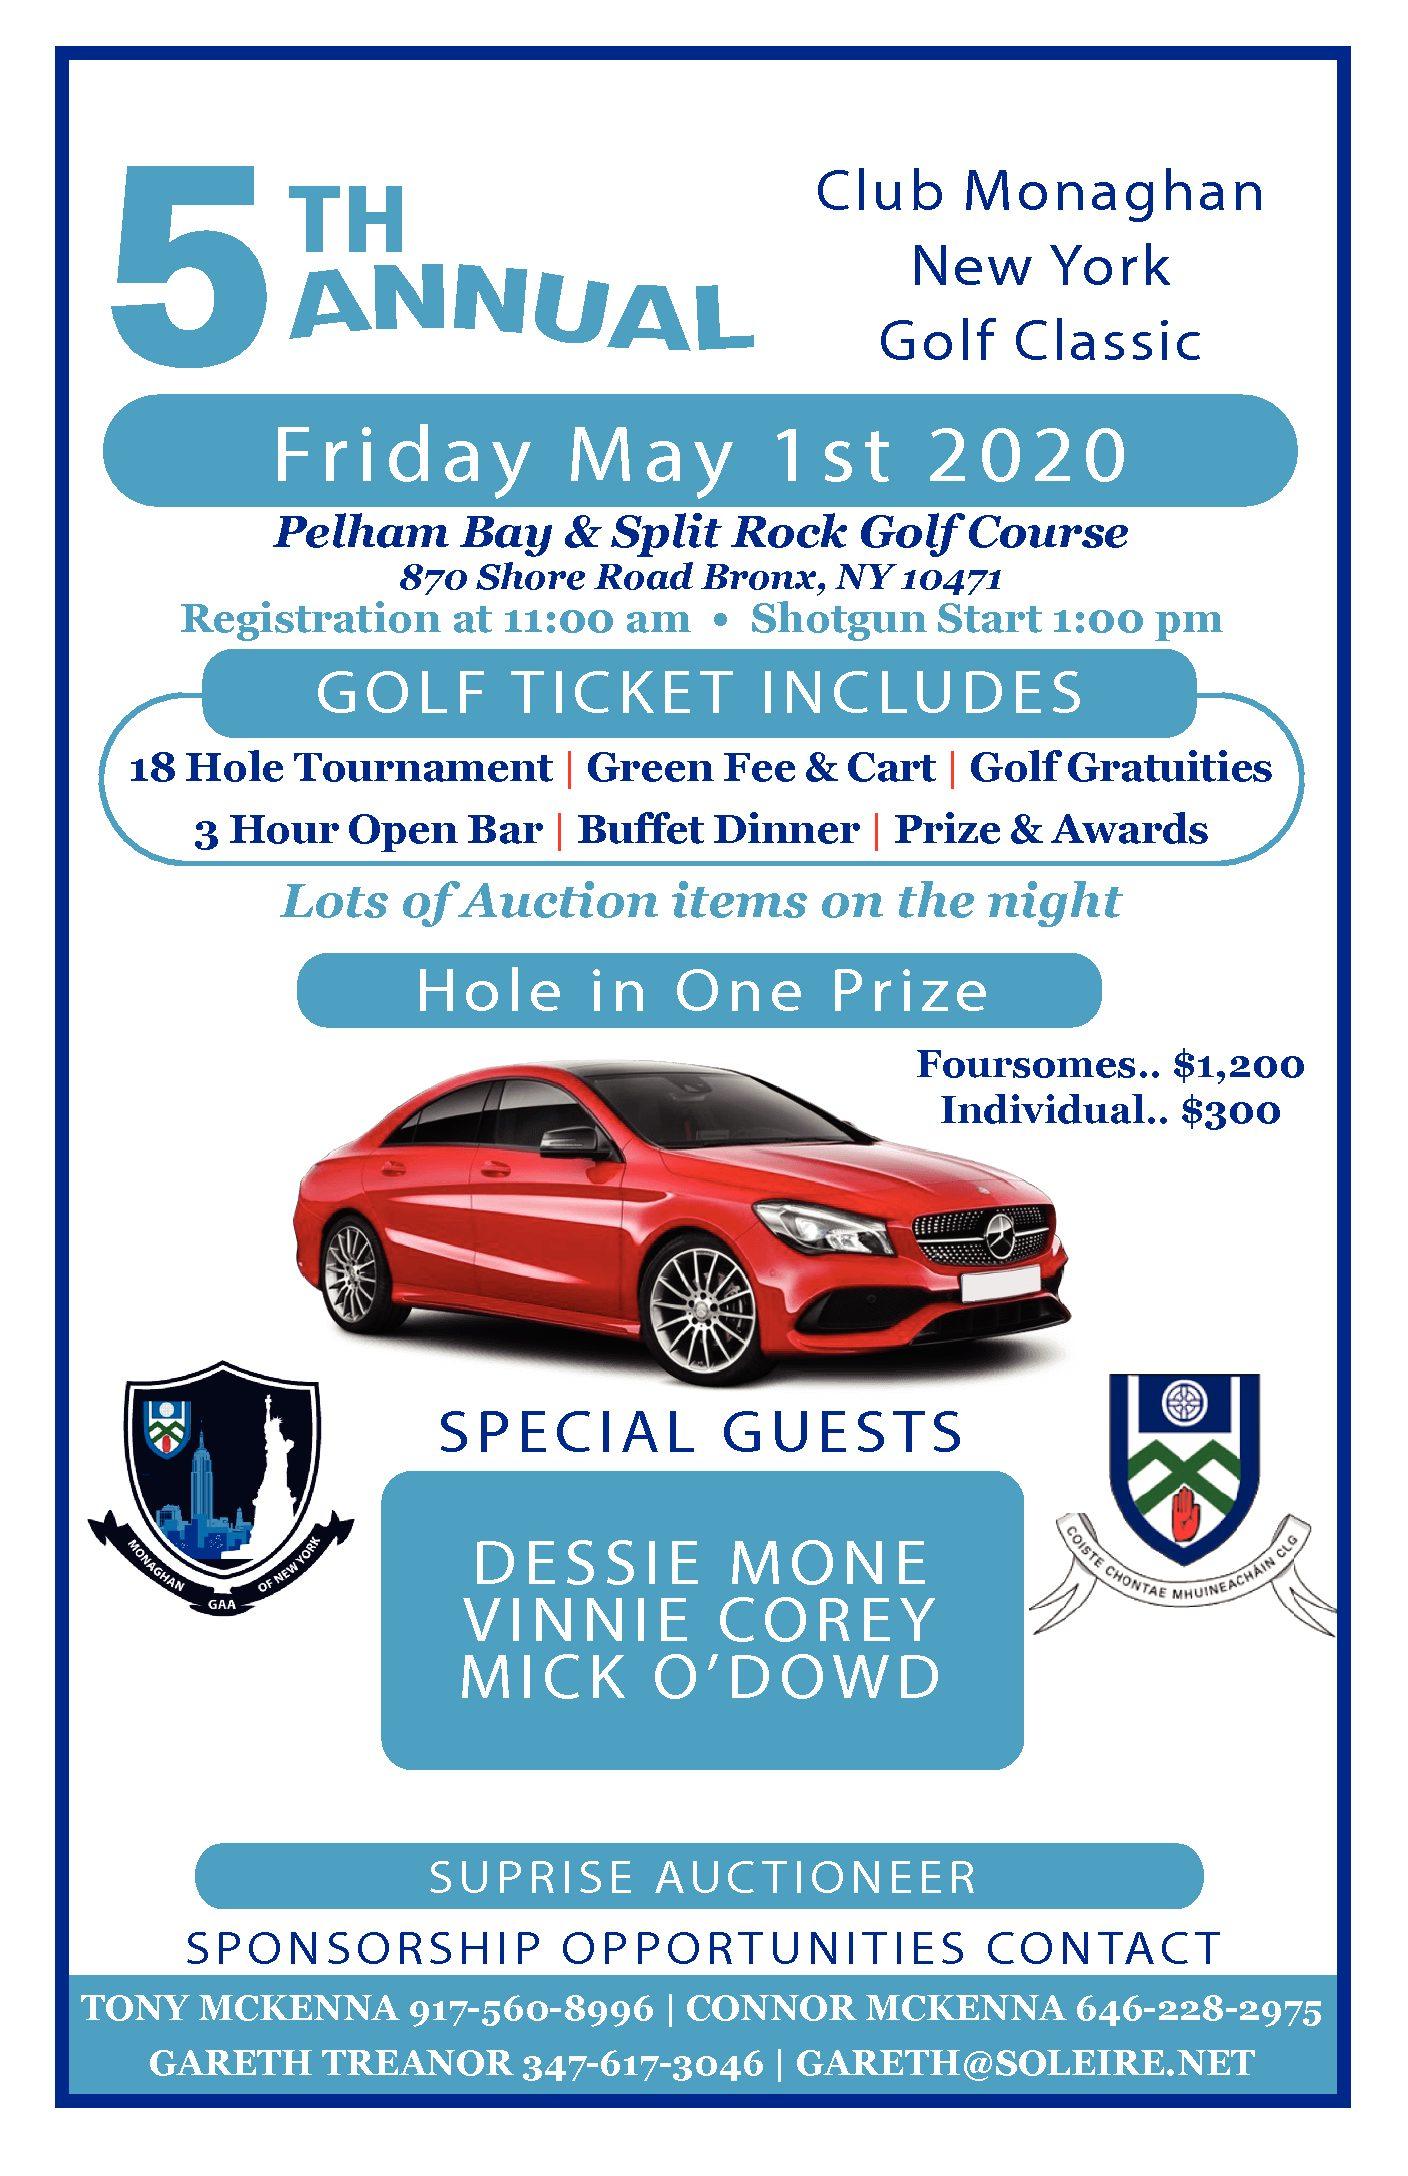 The 5th Annual Club Monaghan GAA New York Golf Classic